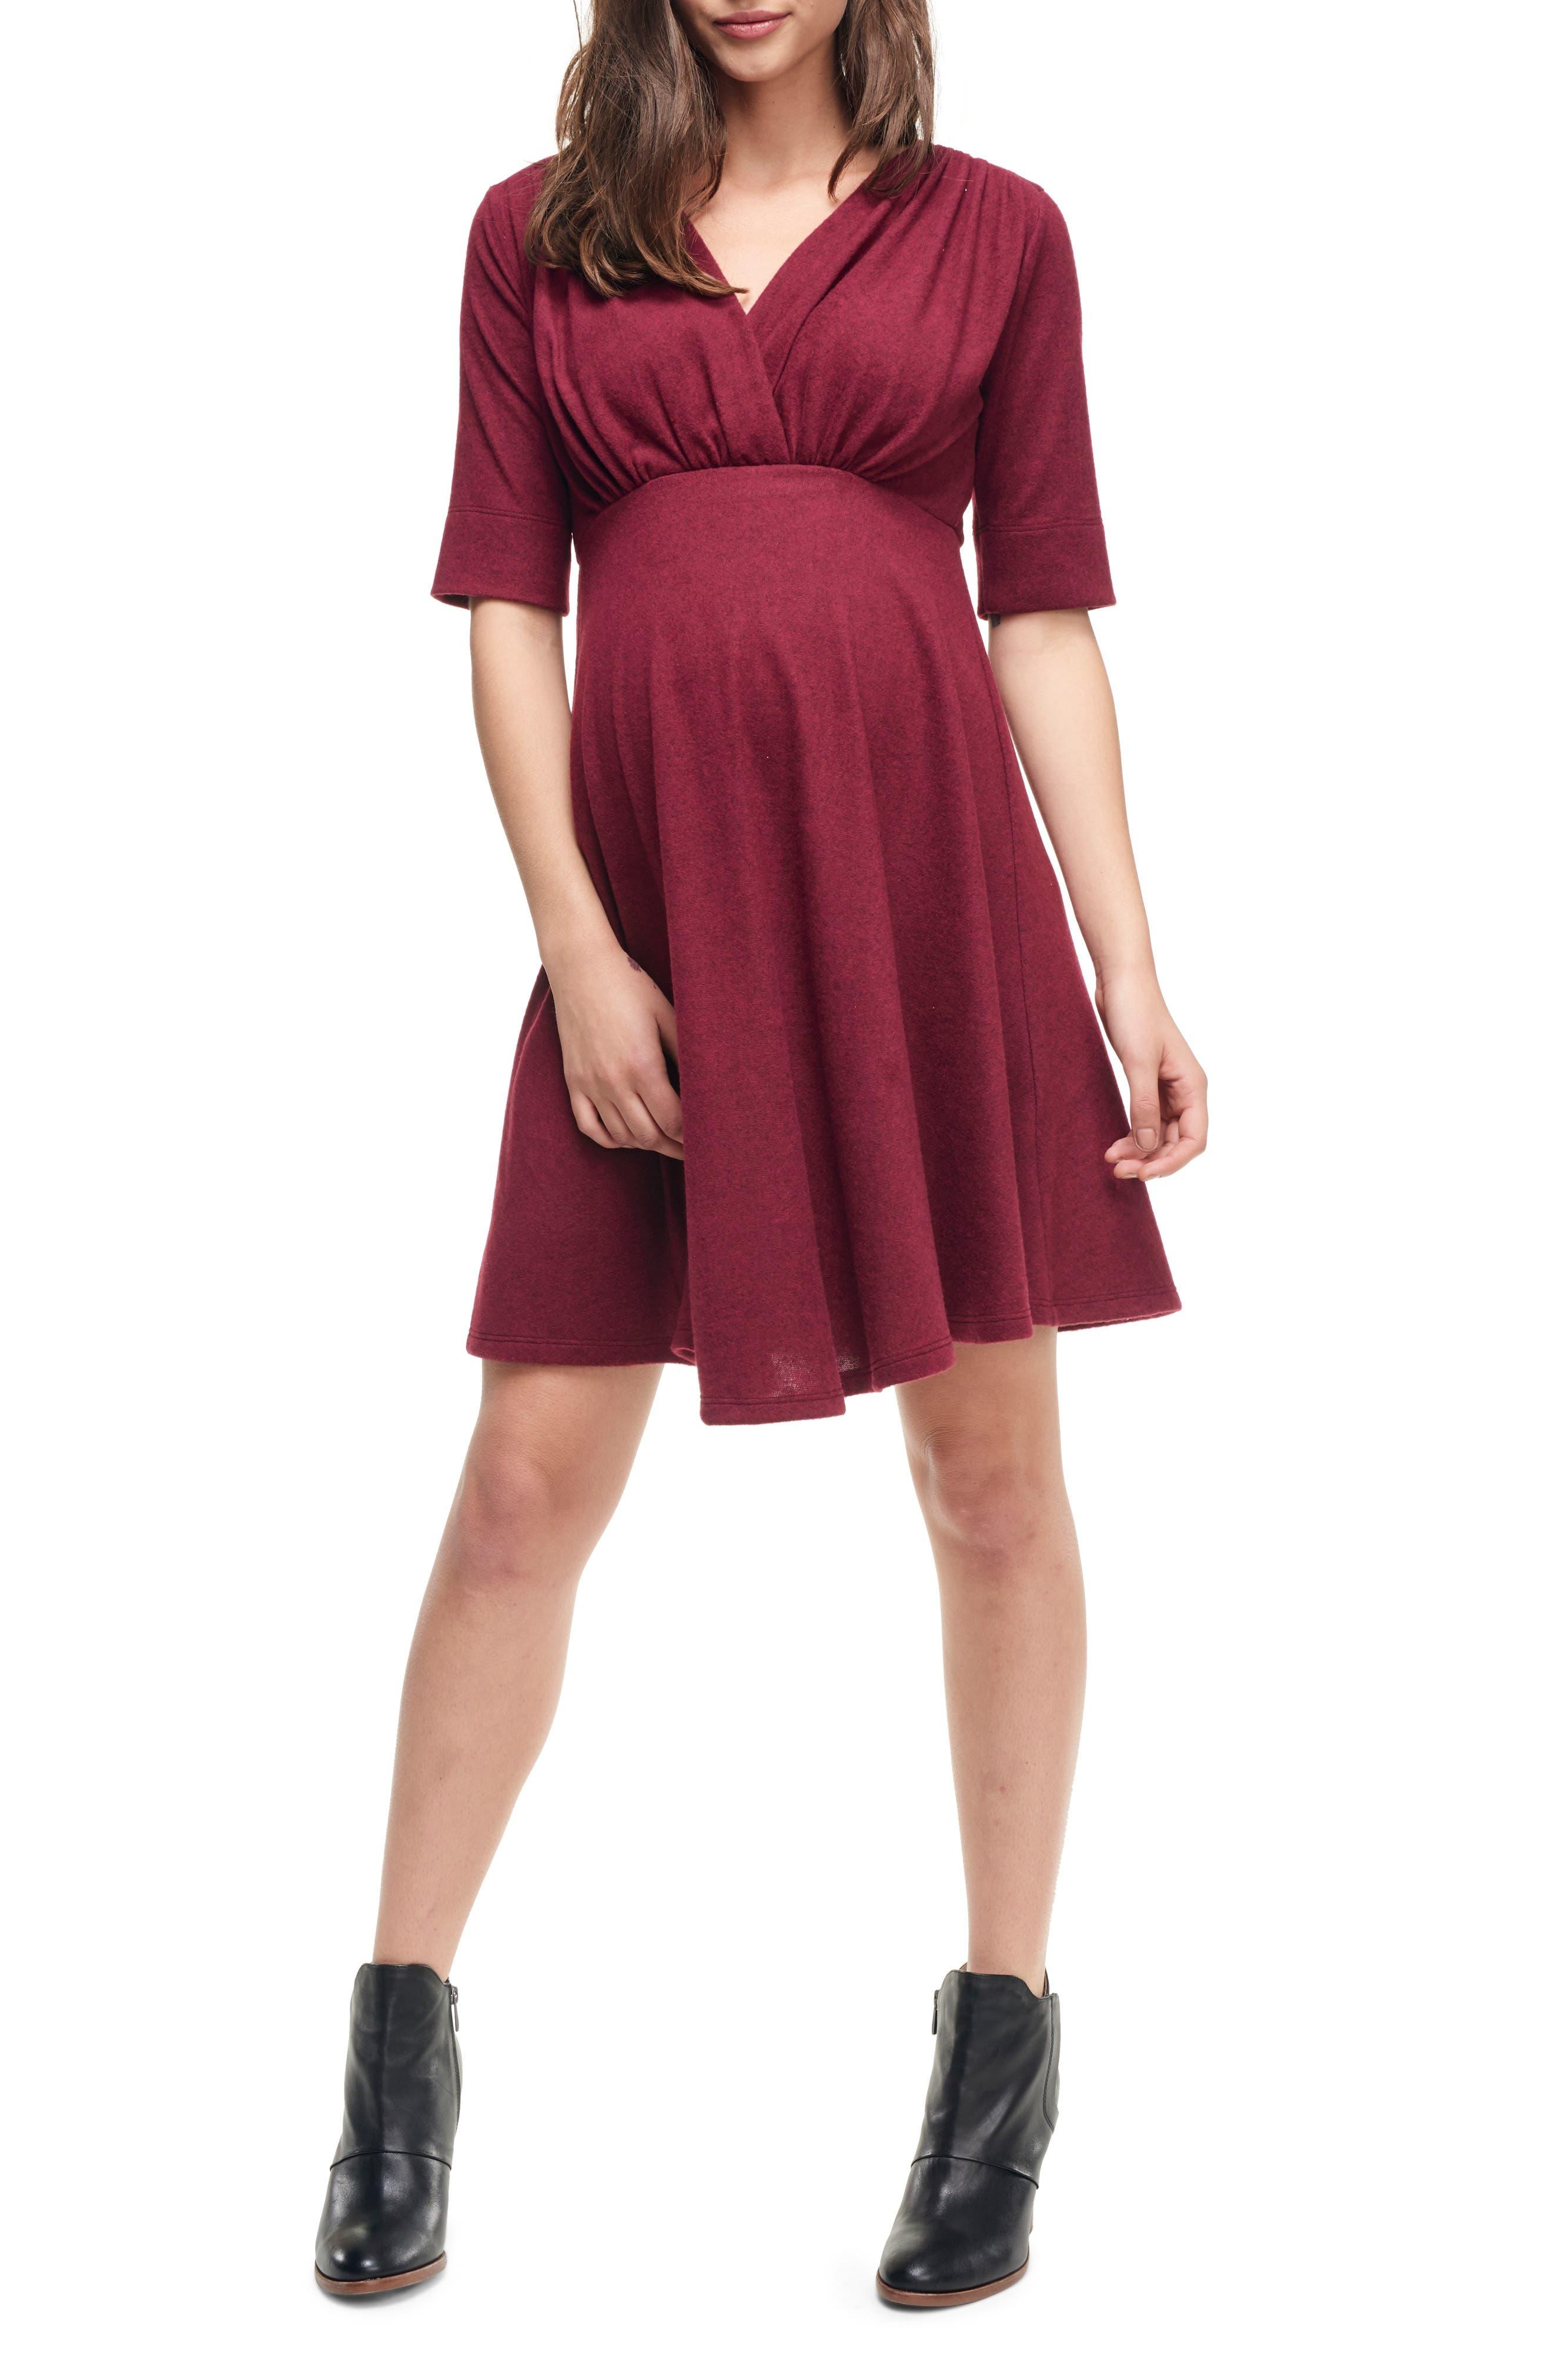 Maternal America Empire Waist Stretch Maternity Dress, Burgundy